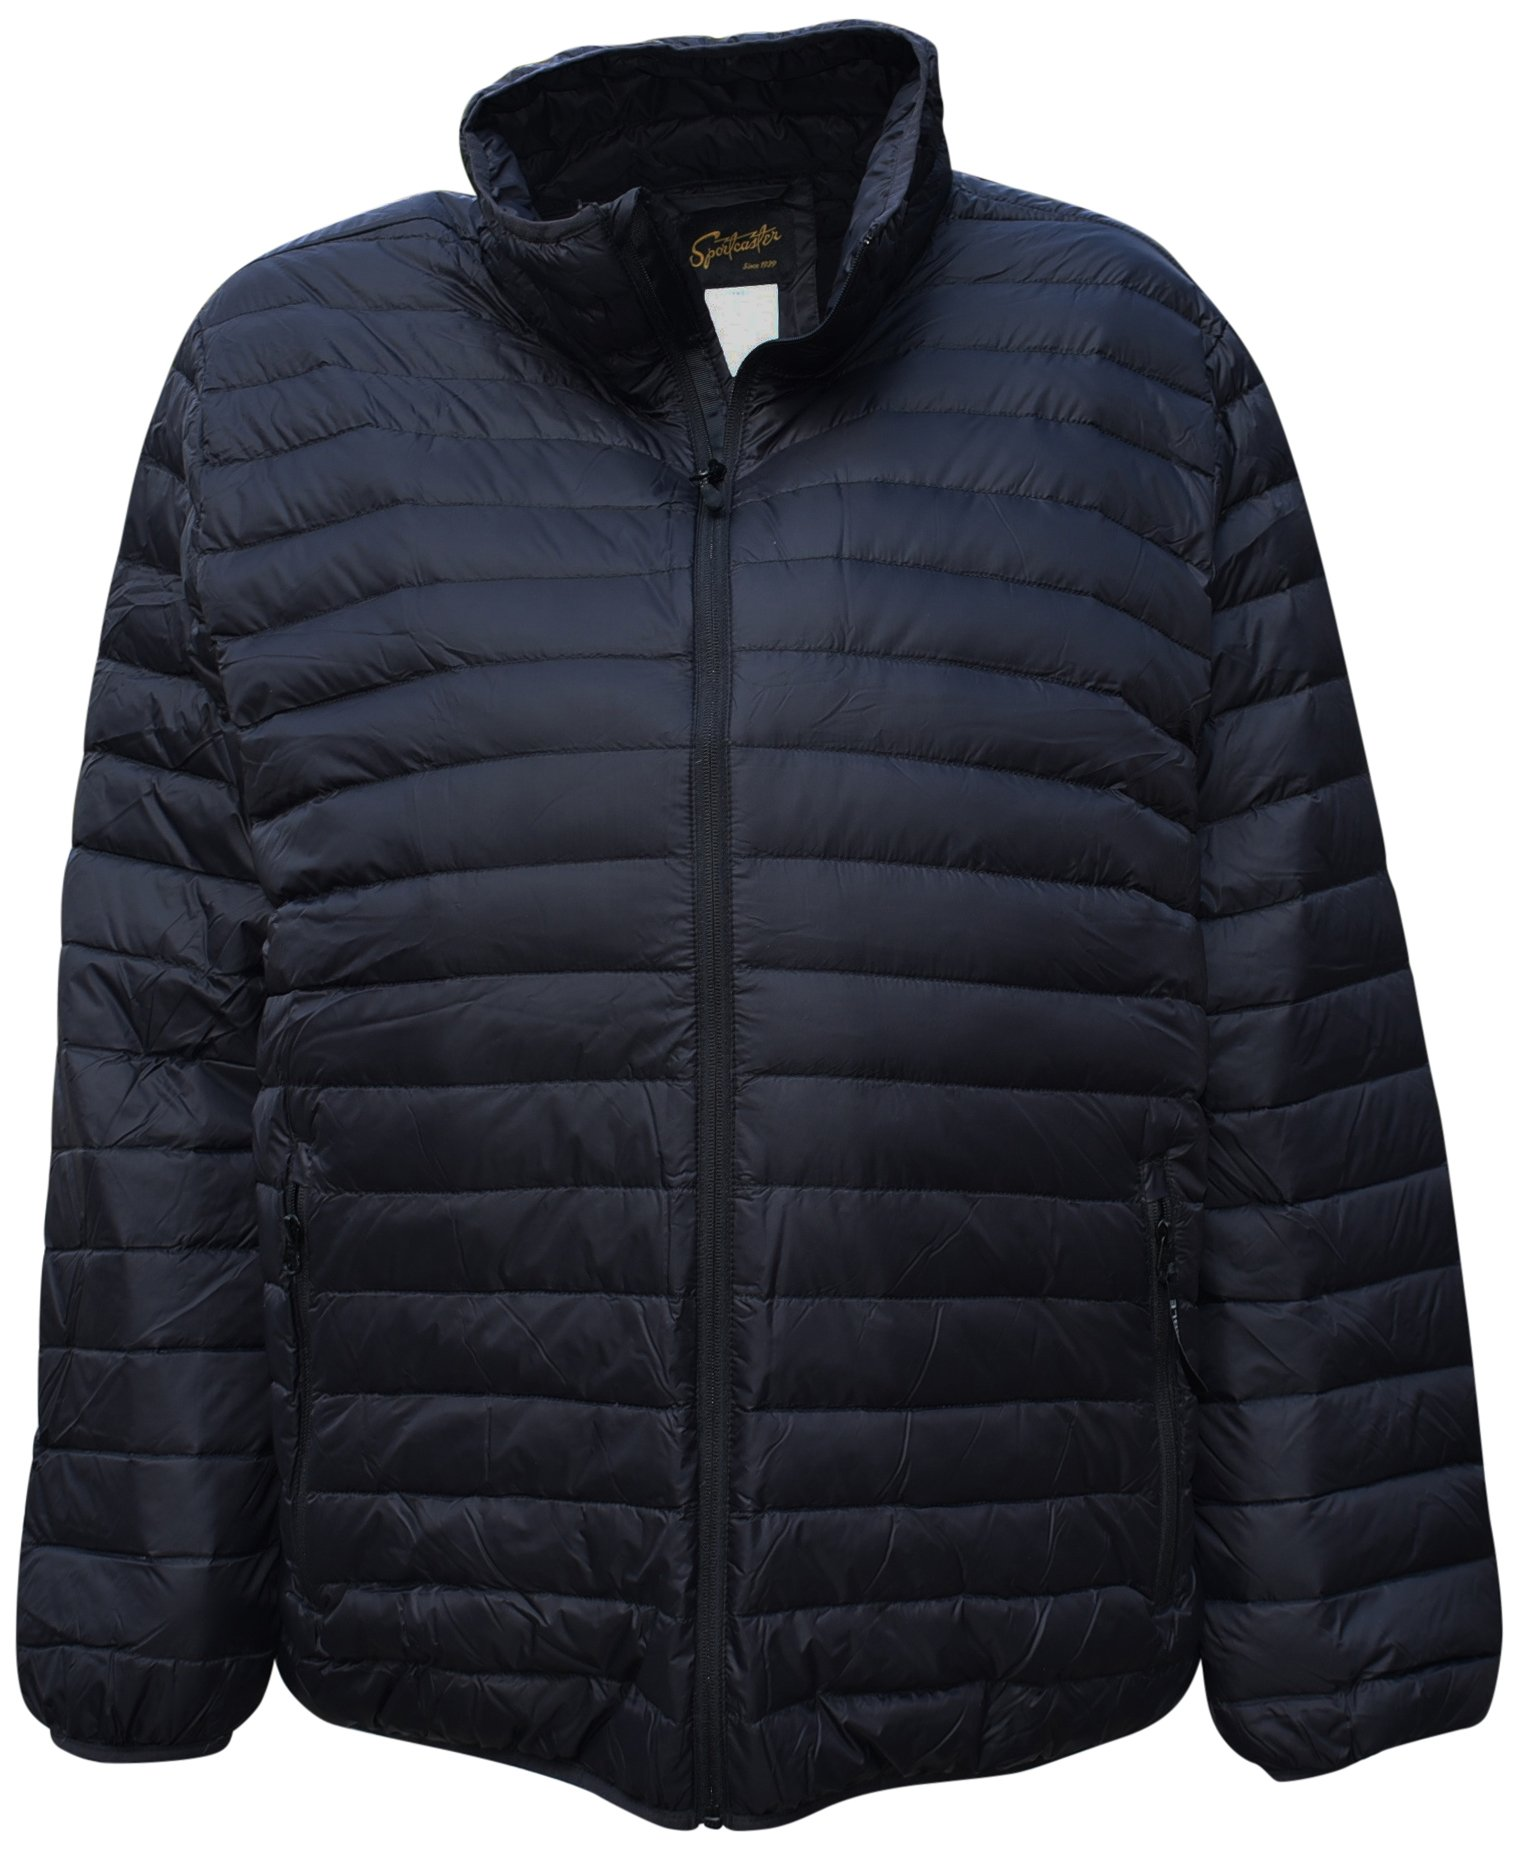 SportCaster Mens Big Sizes Packable Down Jacket (3XL, Black) by SportCaster